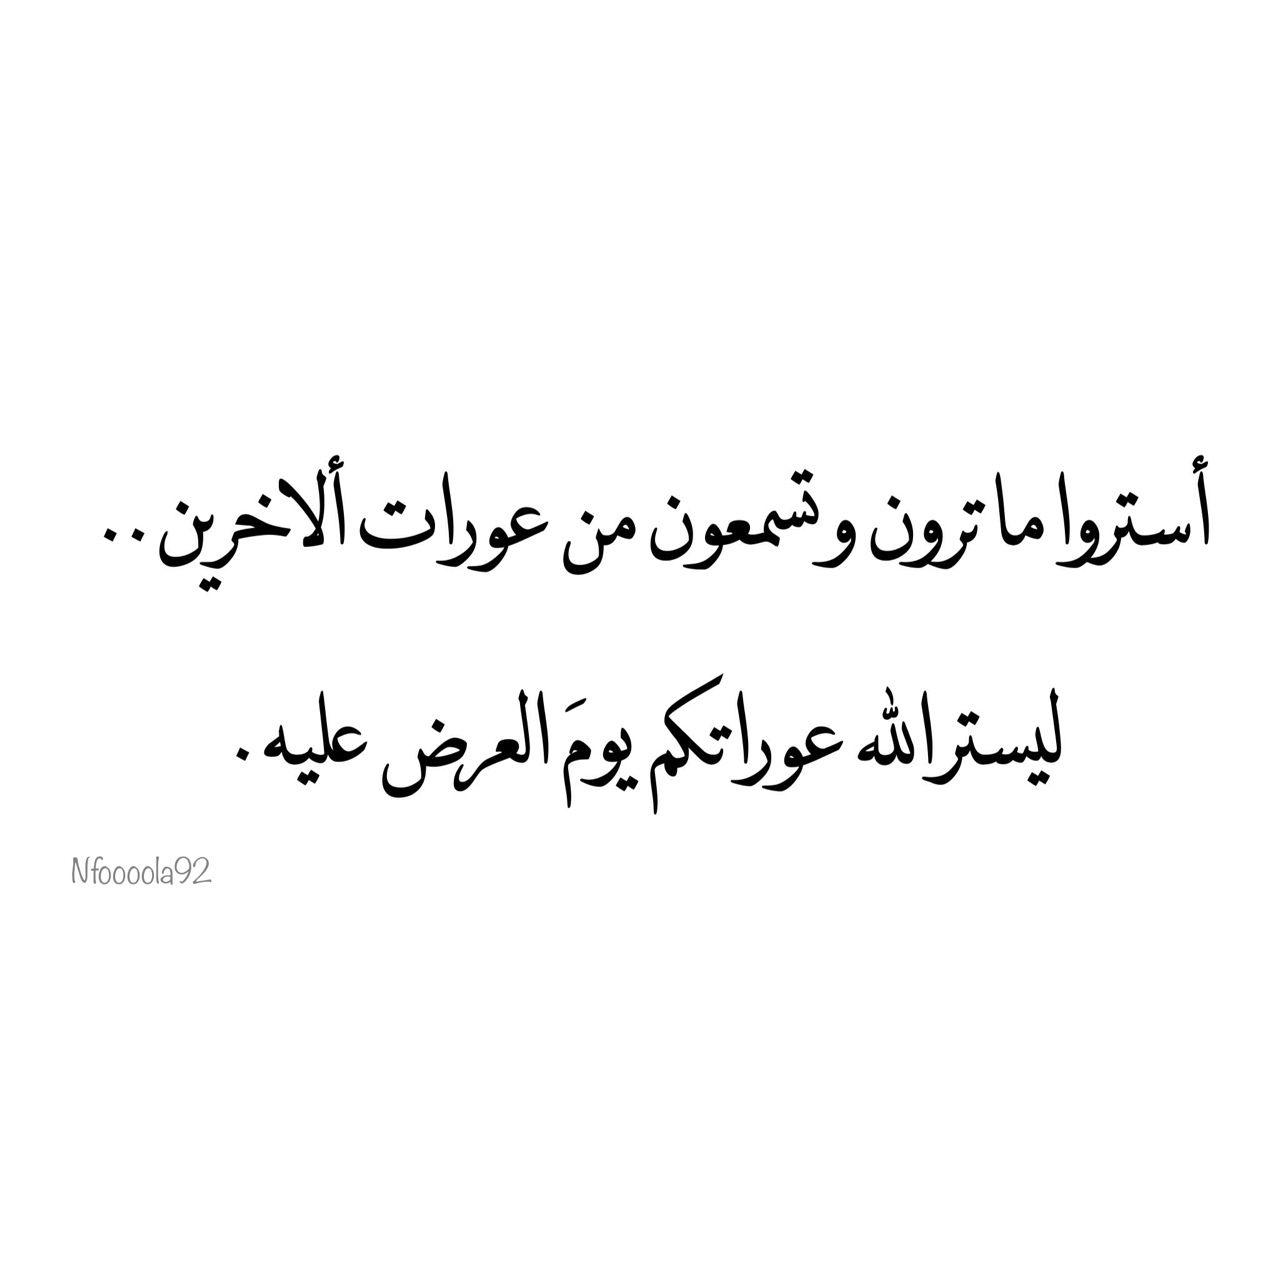 ومن ستر مسلما ستره الله يوم القيامة Quran Quotes Wise Words Quotes Islamic Quotes